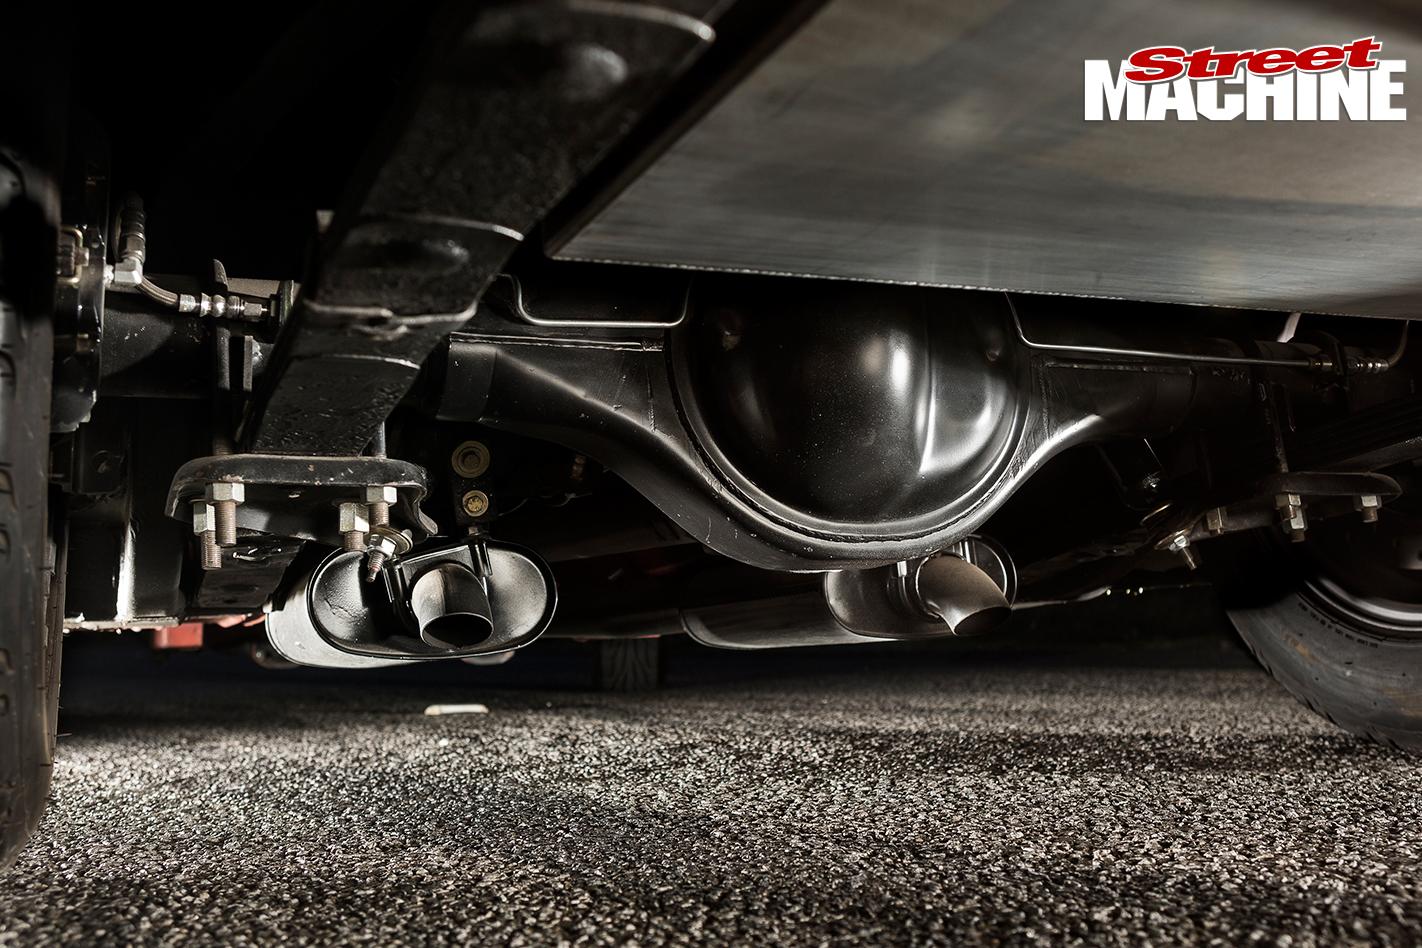 Ford -Mustang -1-underside